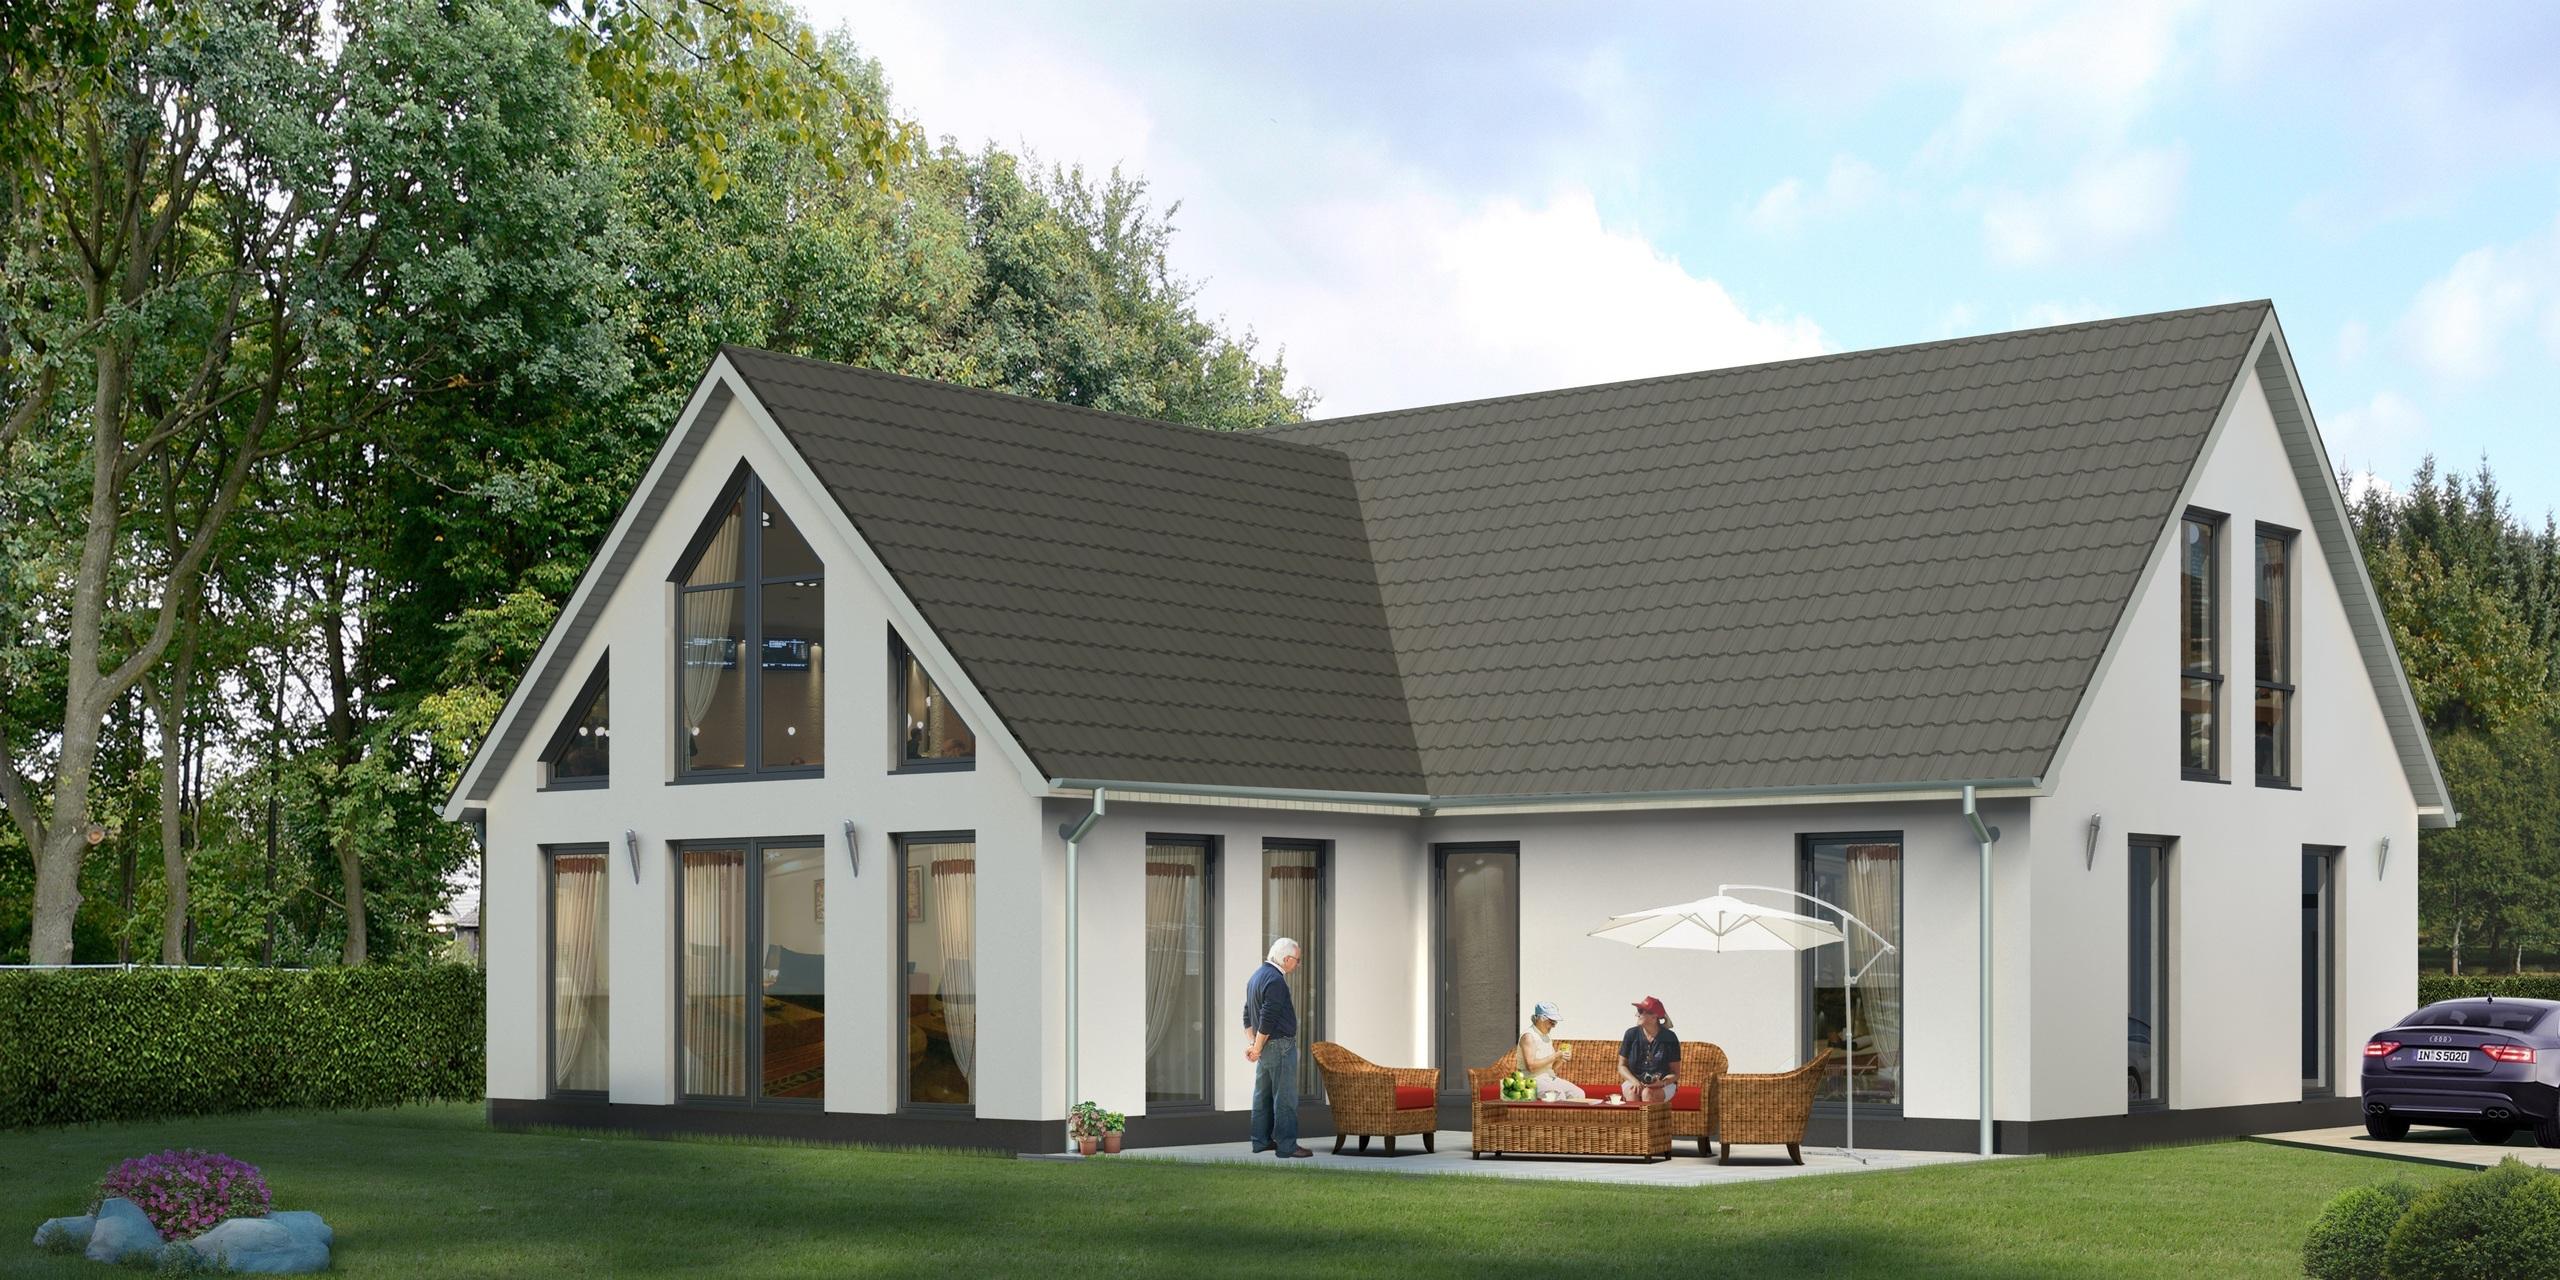 Suchauftrag  Appelt Immobilien  Immobilien Service  Makler in Cuxhaven